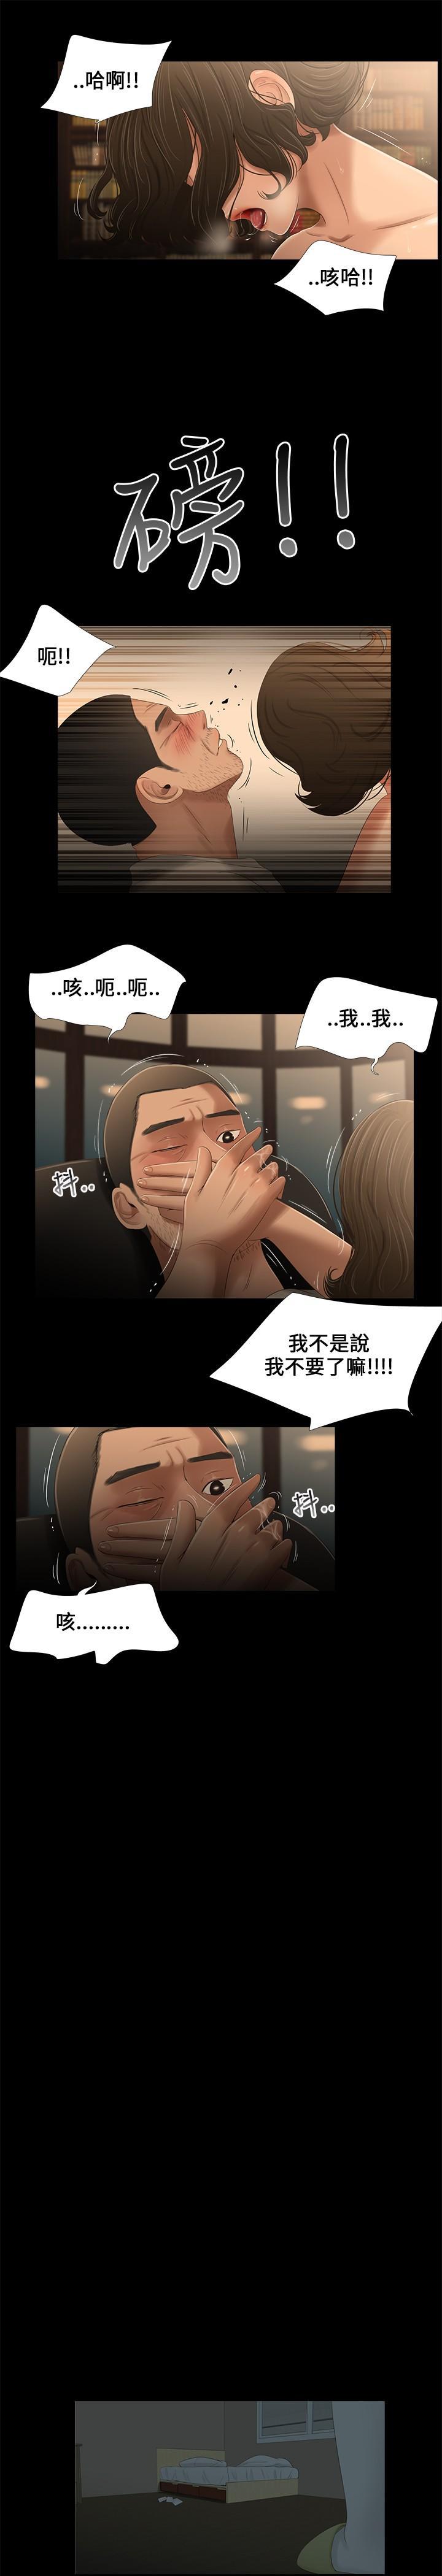 Three sisters 三姐妹Ch.13~19 (Chinese)中文 74